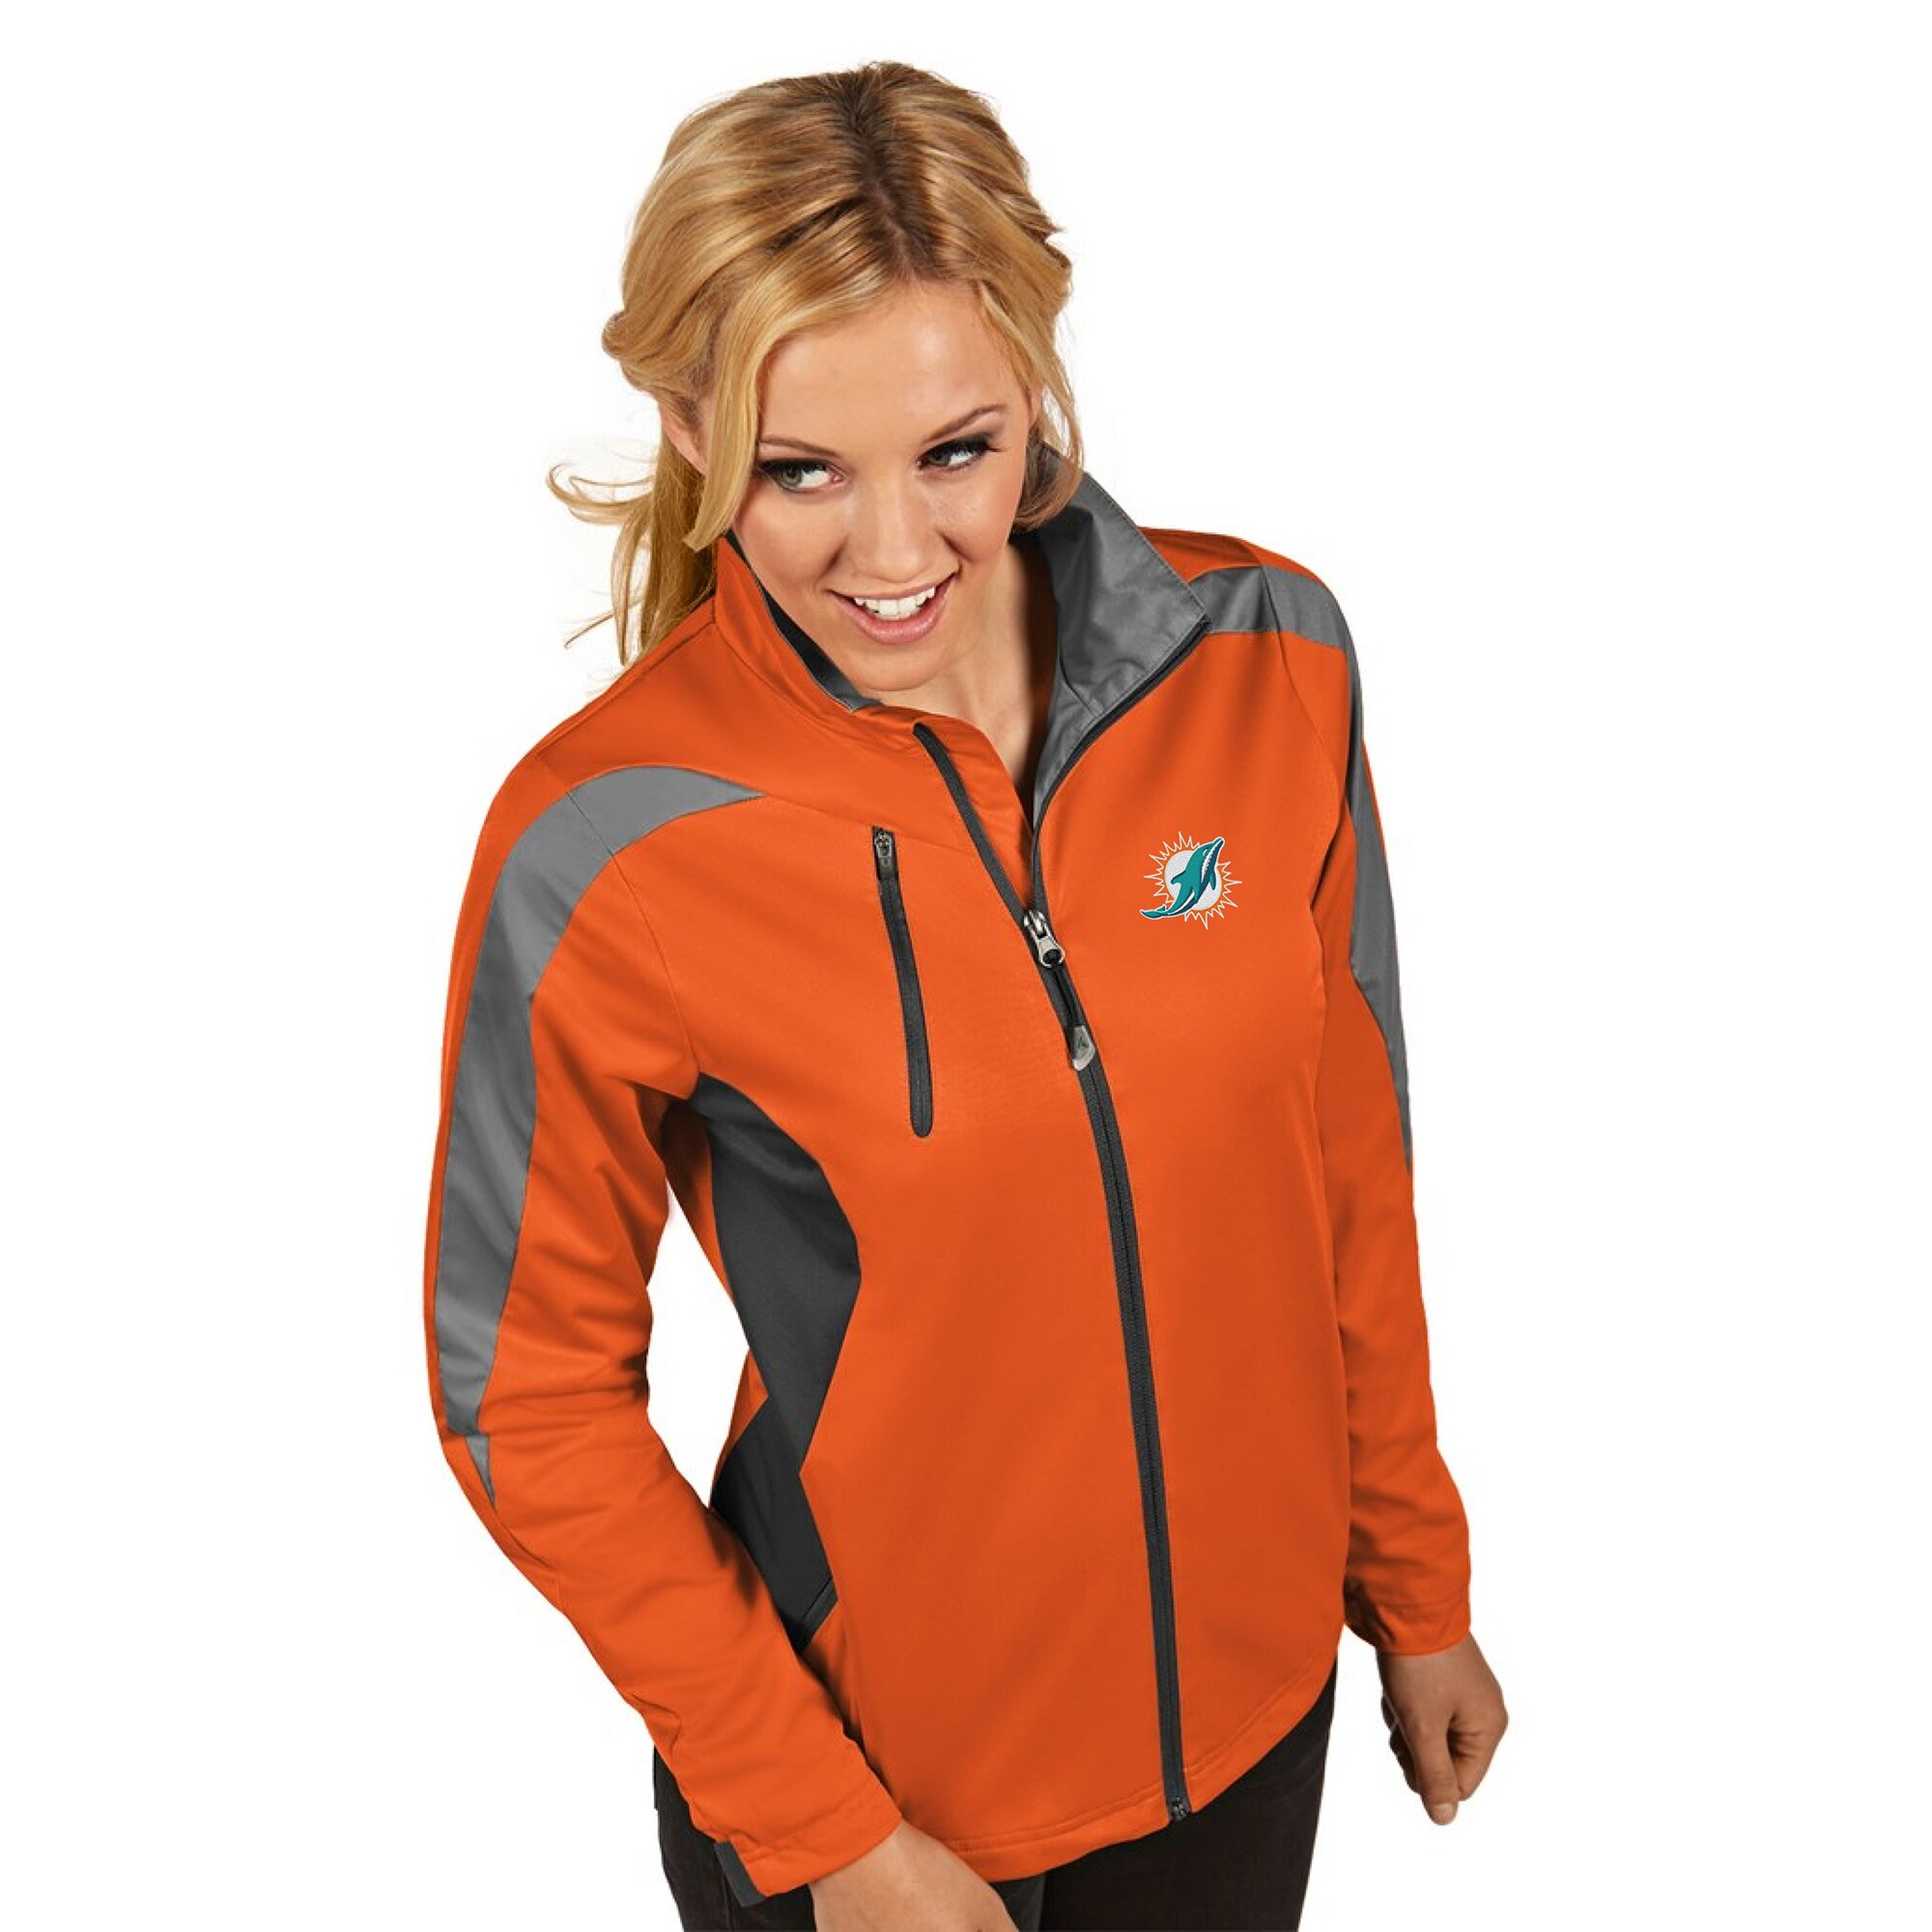 Miami Dolphins Women's Antigua Discover Full-Zip Jacket - Orange